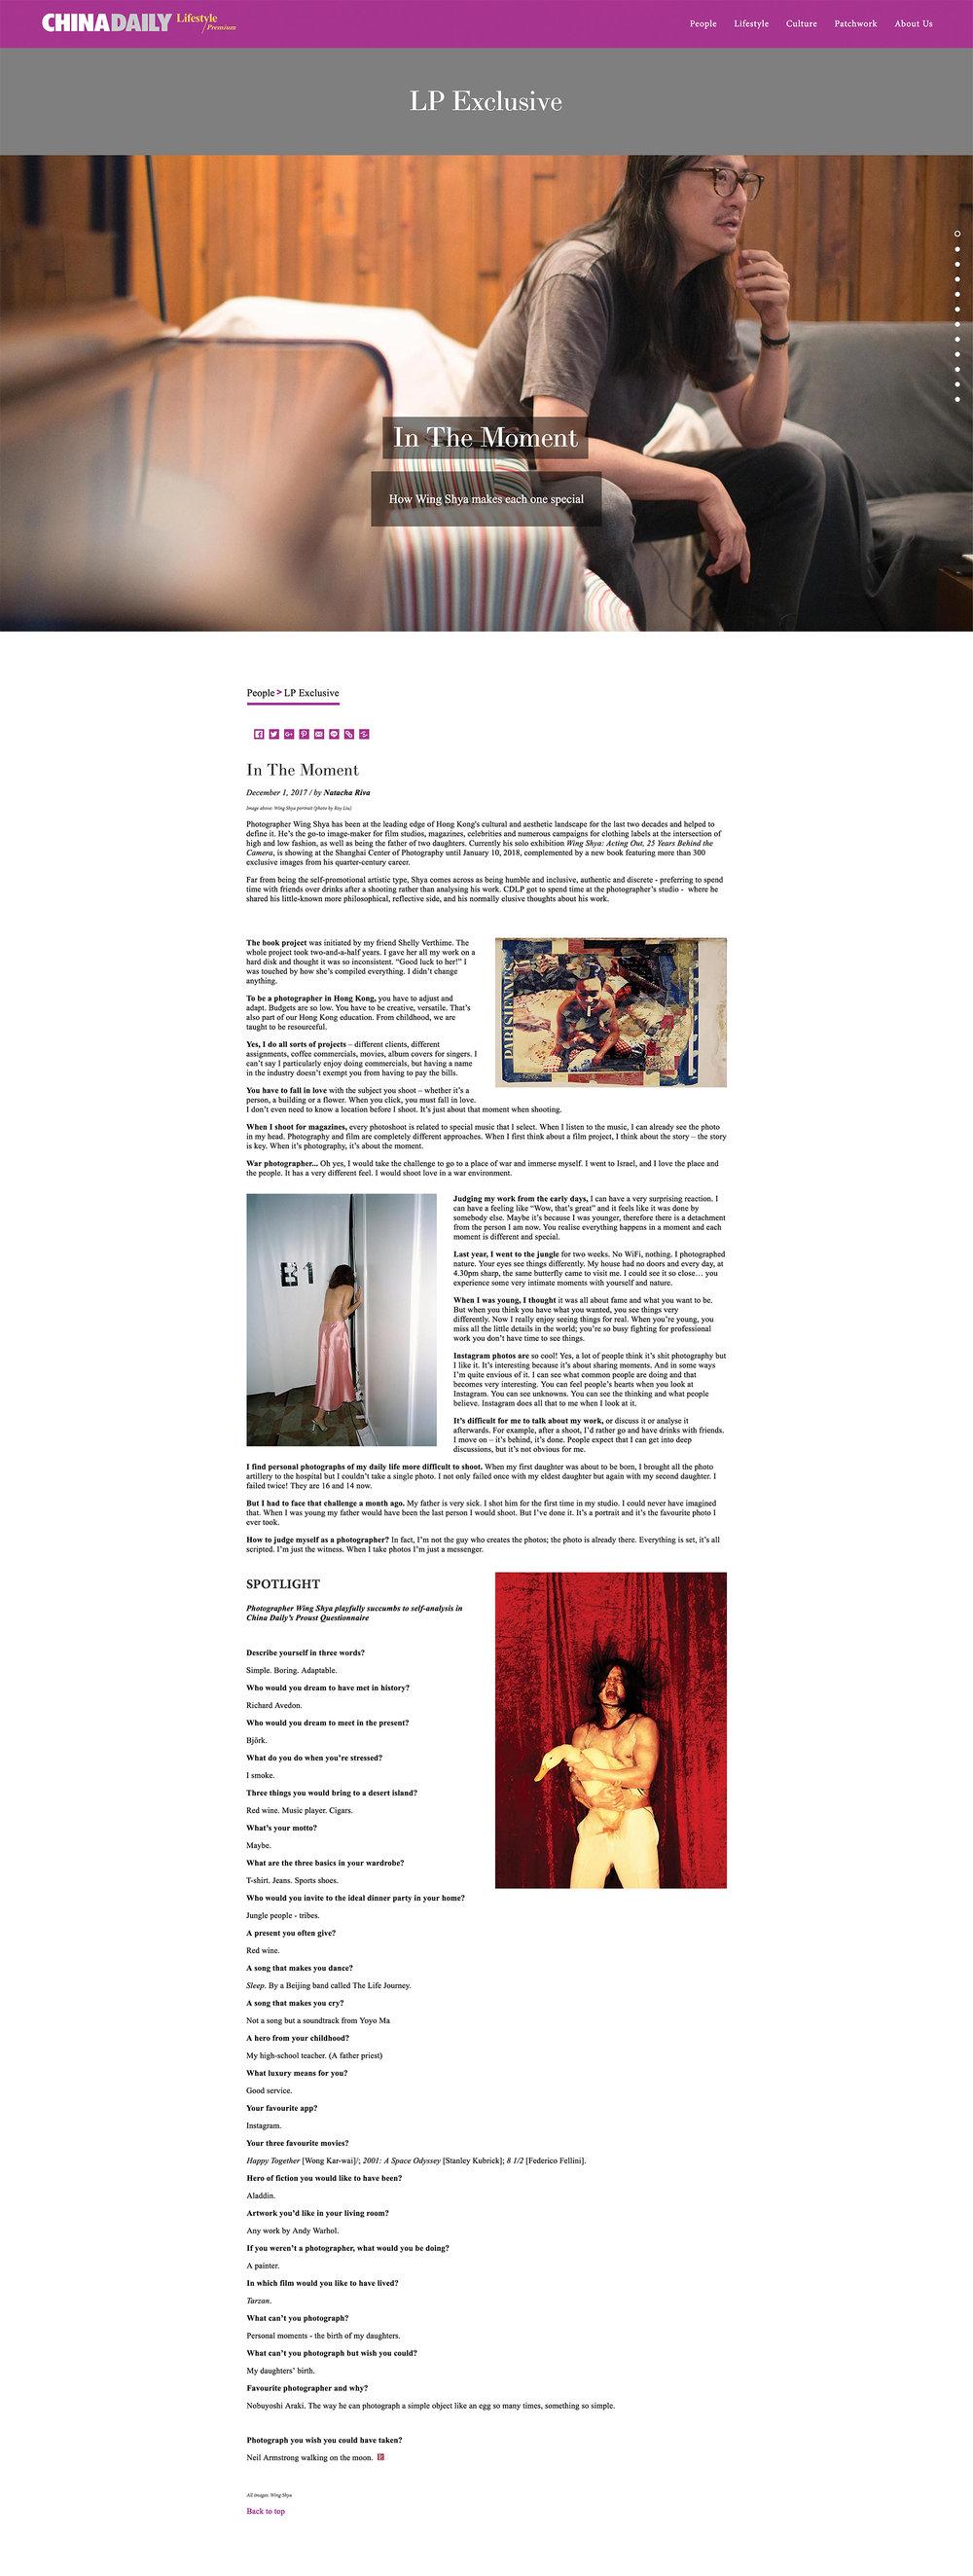 China Daily.com.jpg